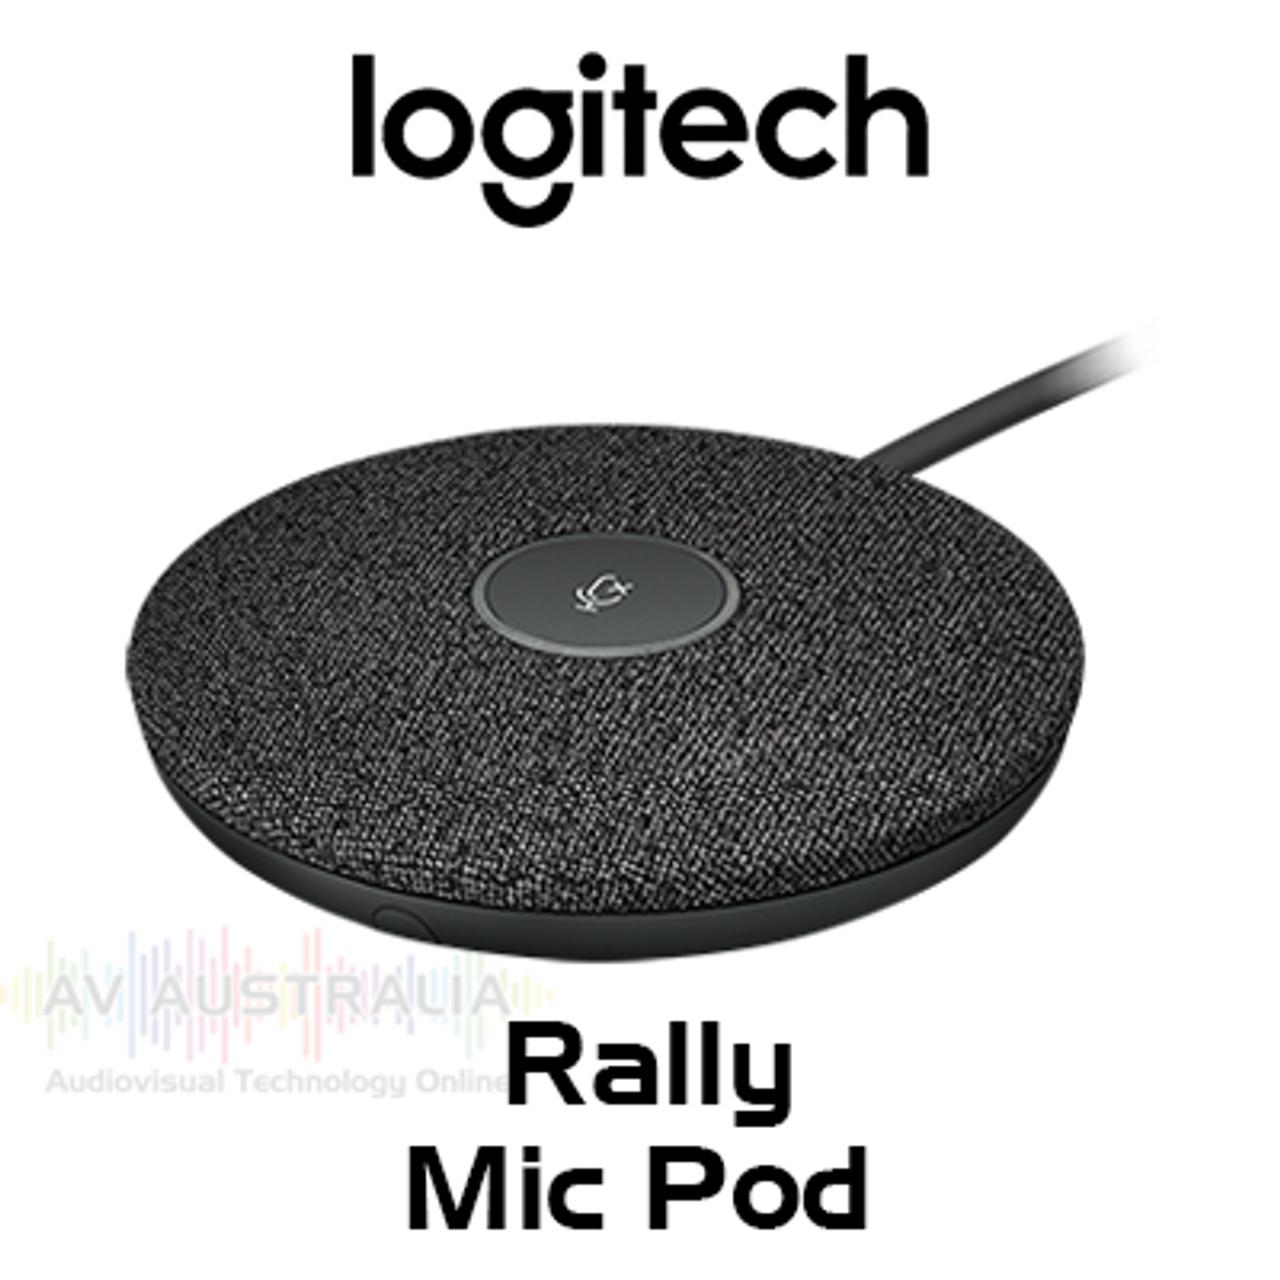 Logitech Rally Mic Pod